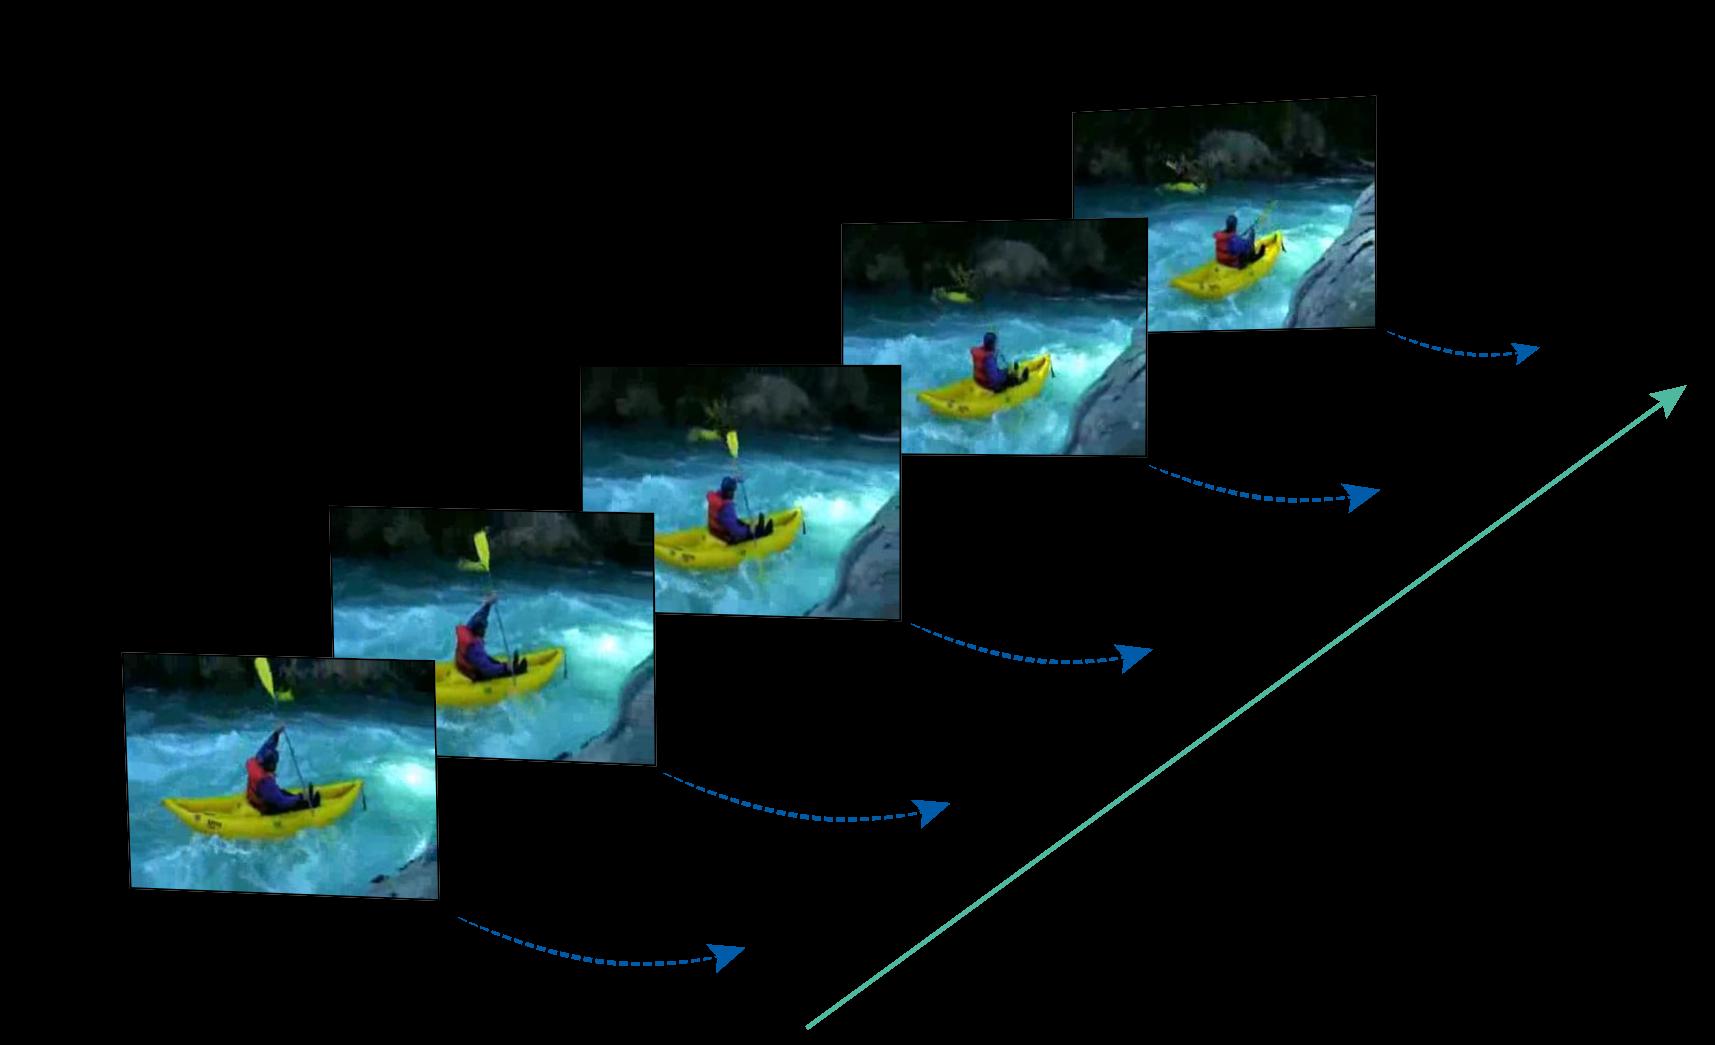 Video Classification